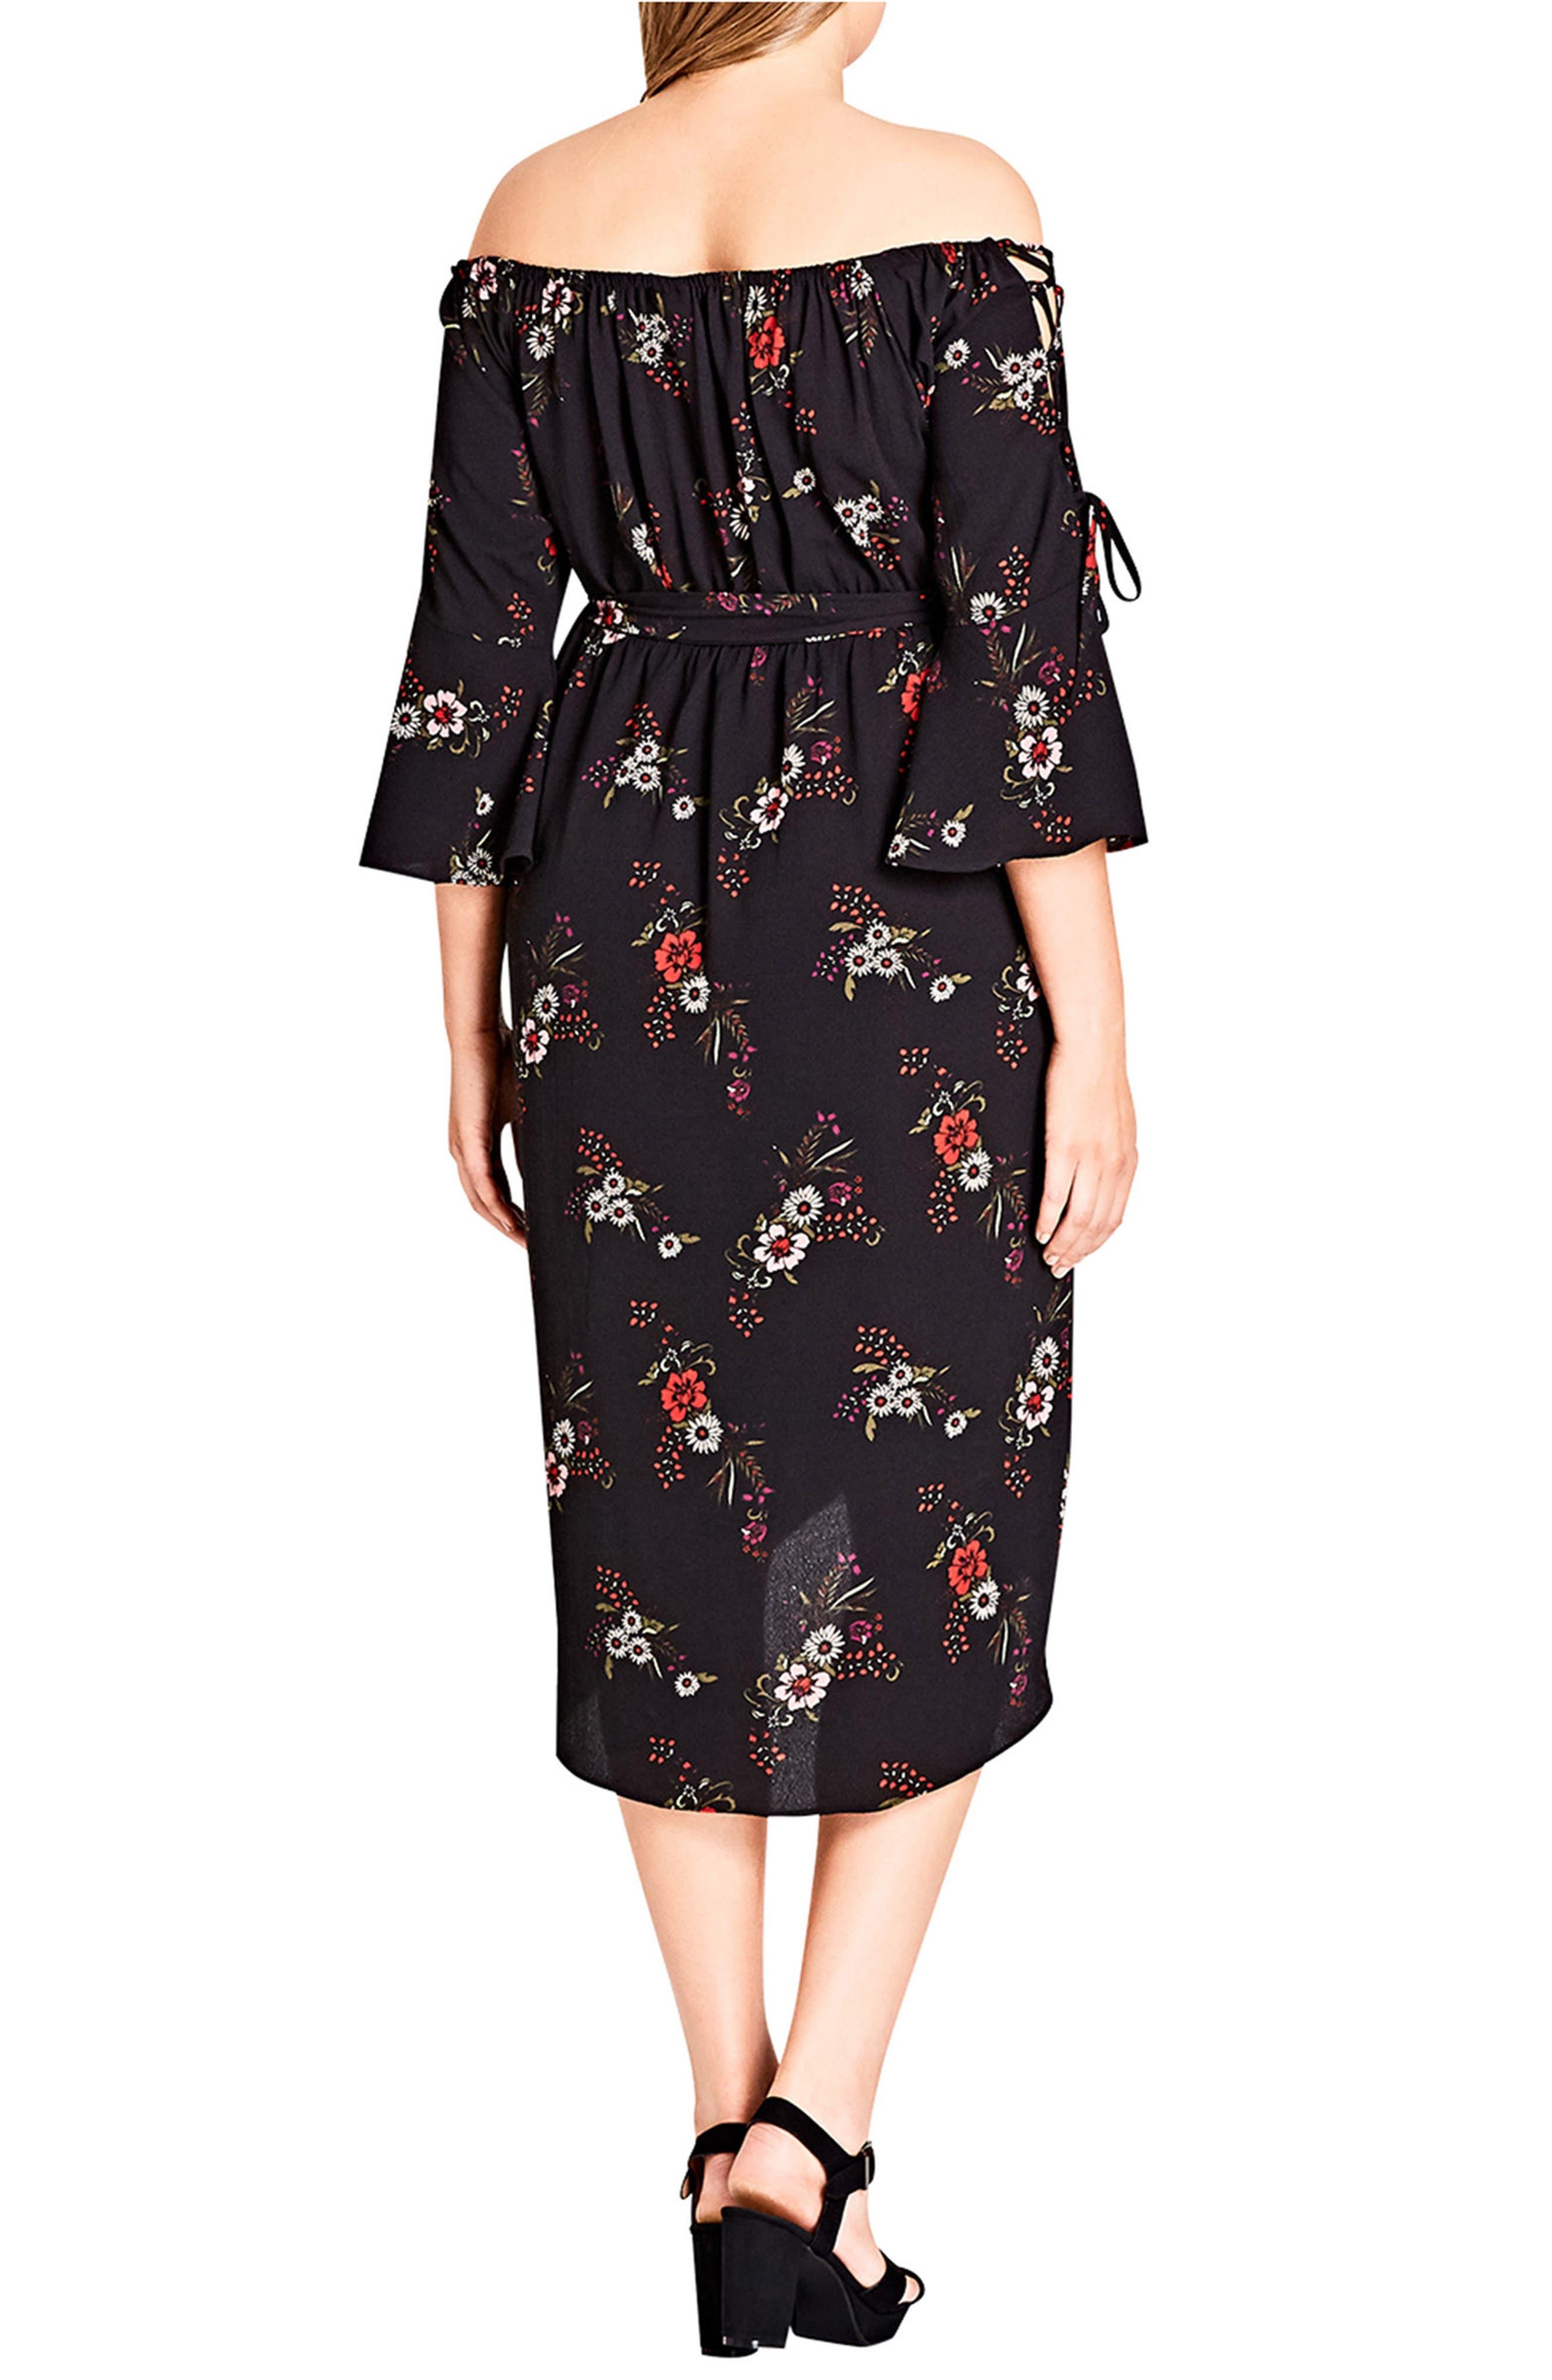 Off the Shoulder Midi Dress,                             Alternate thumbnail 2, color,                             Skye Floral